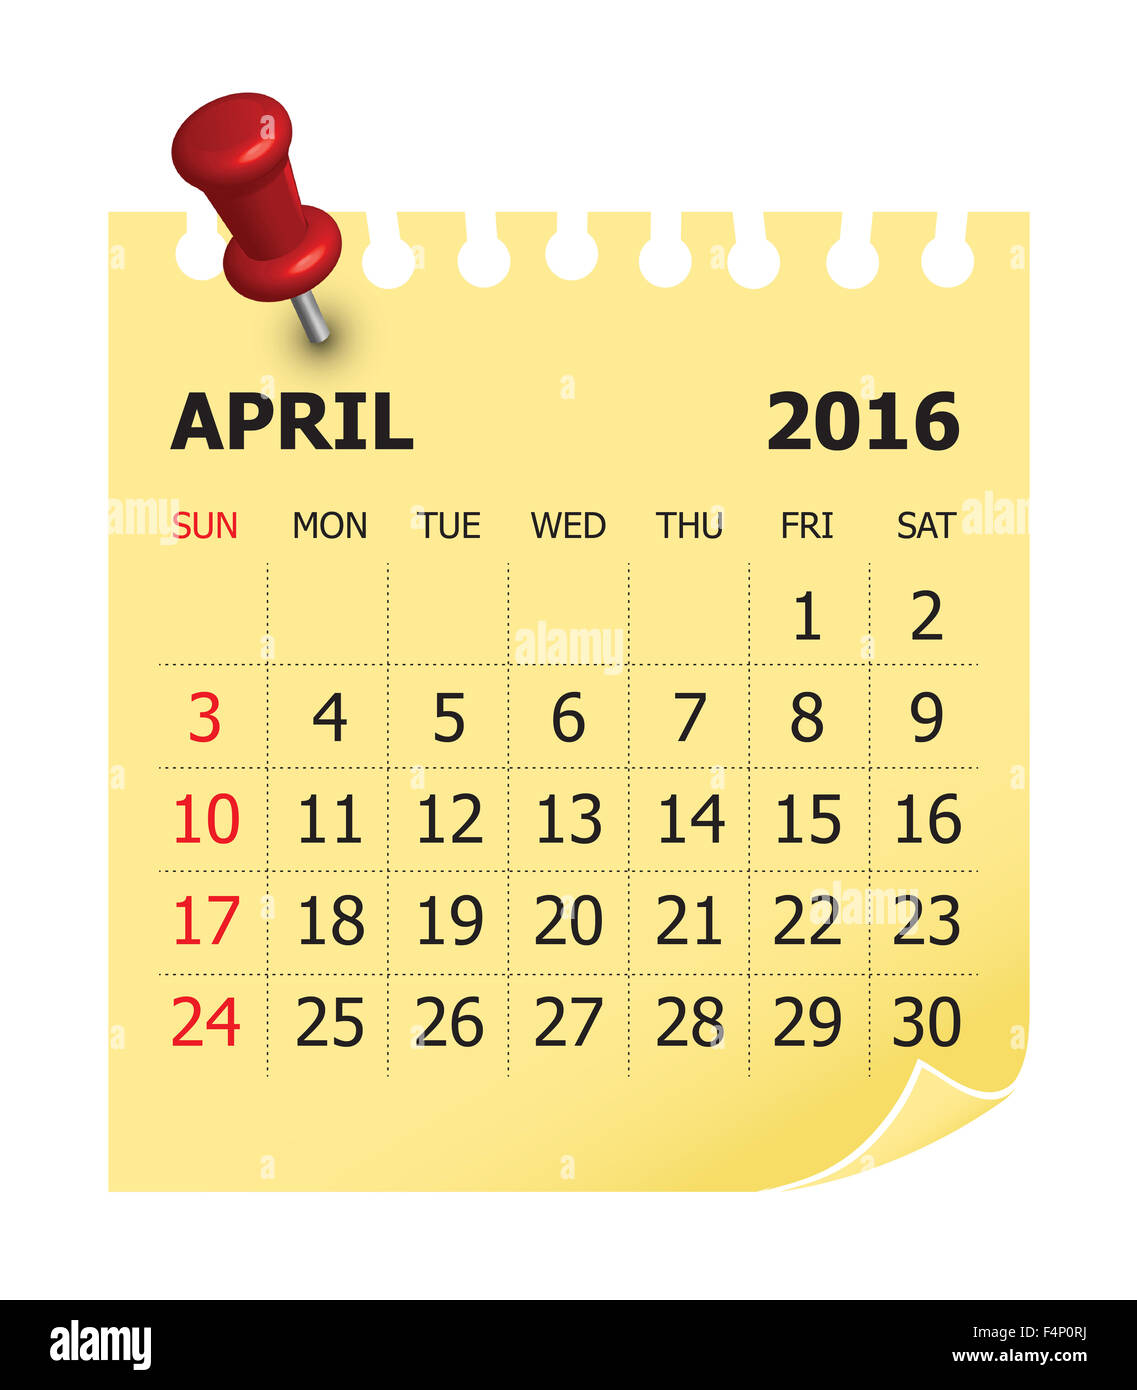 Simple calendar for April 2016 - Stock Image